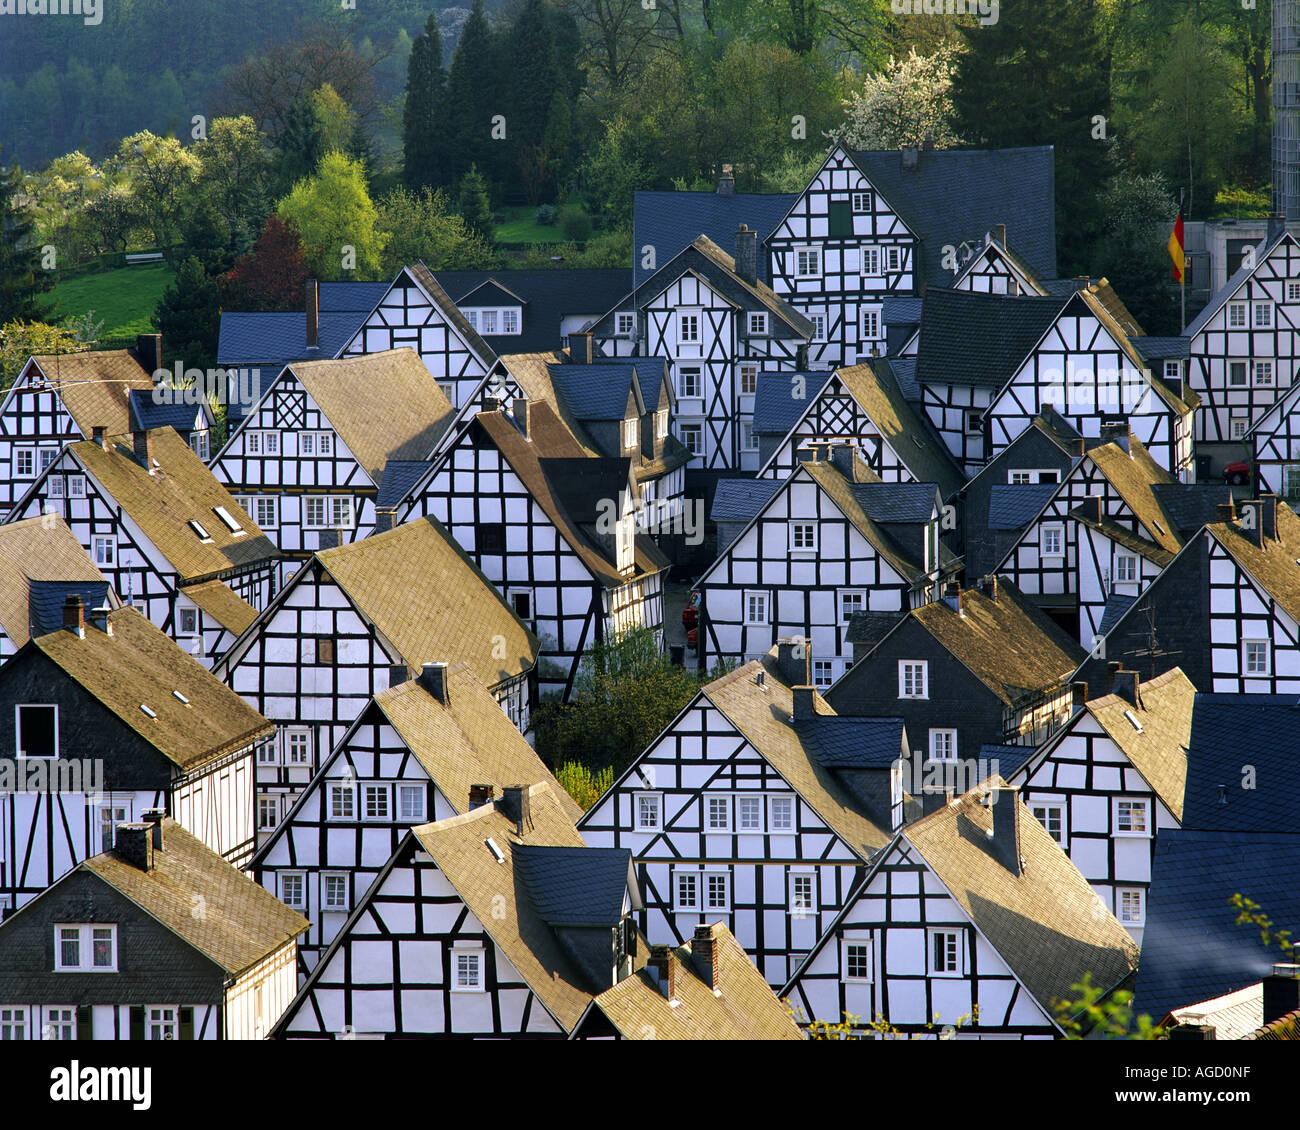 DE - norte-Rin del Norte-Westfalia: pintoresco pueblo de Freudenberg Imagen De Stock